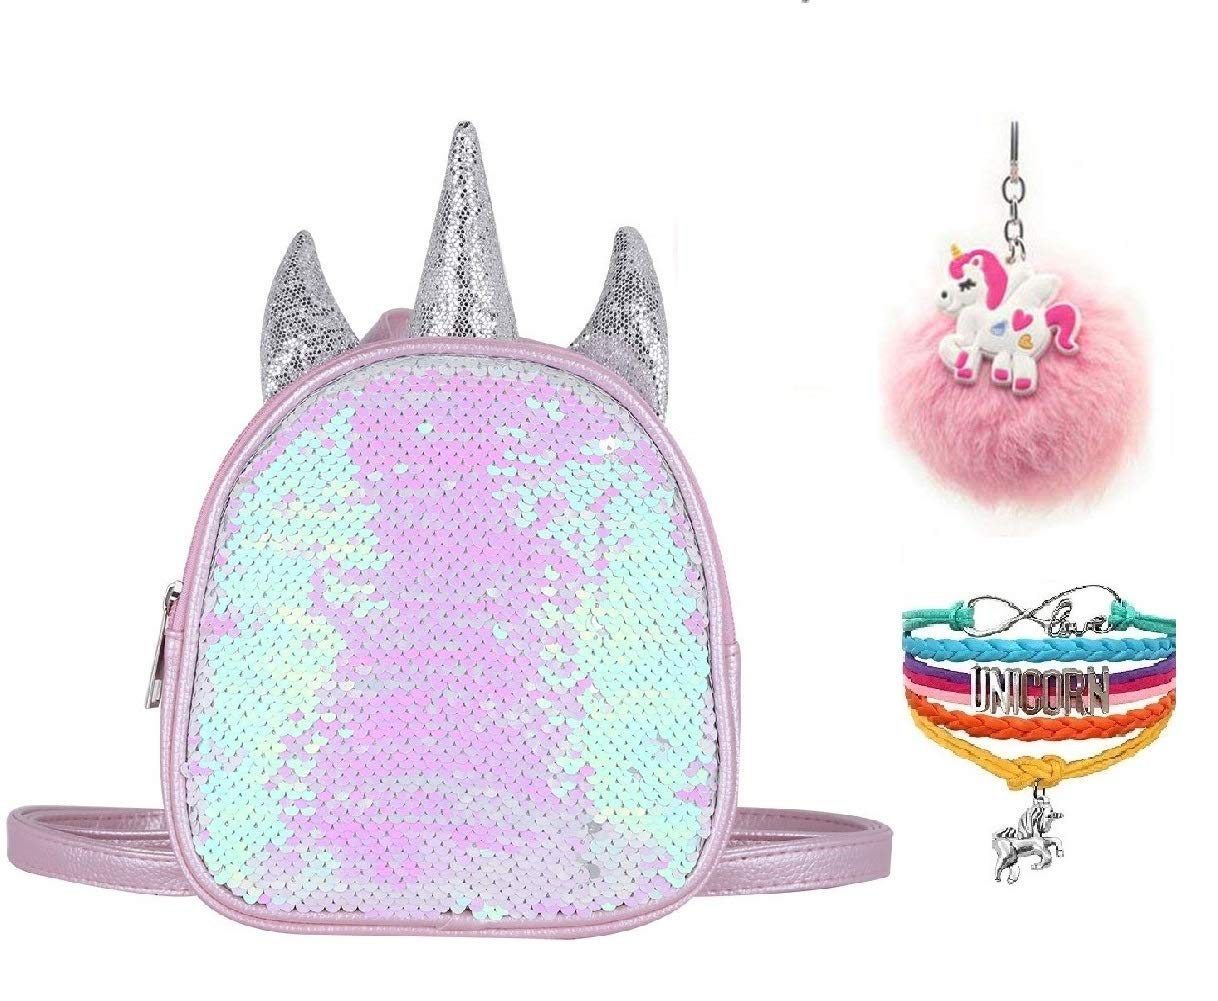 Fanovo Mermaid Sequin Unicorn Backpack Mini Satchel Daypack Travel Shoulder Bag Pink 7 inch + Unicorn Keychain + Unicorn Bracelet